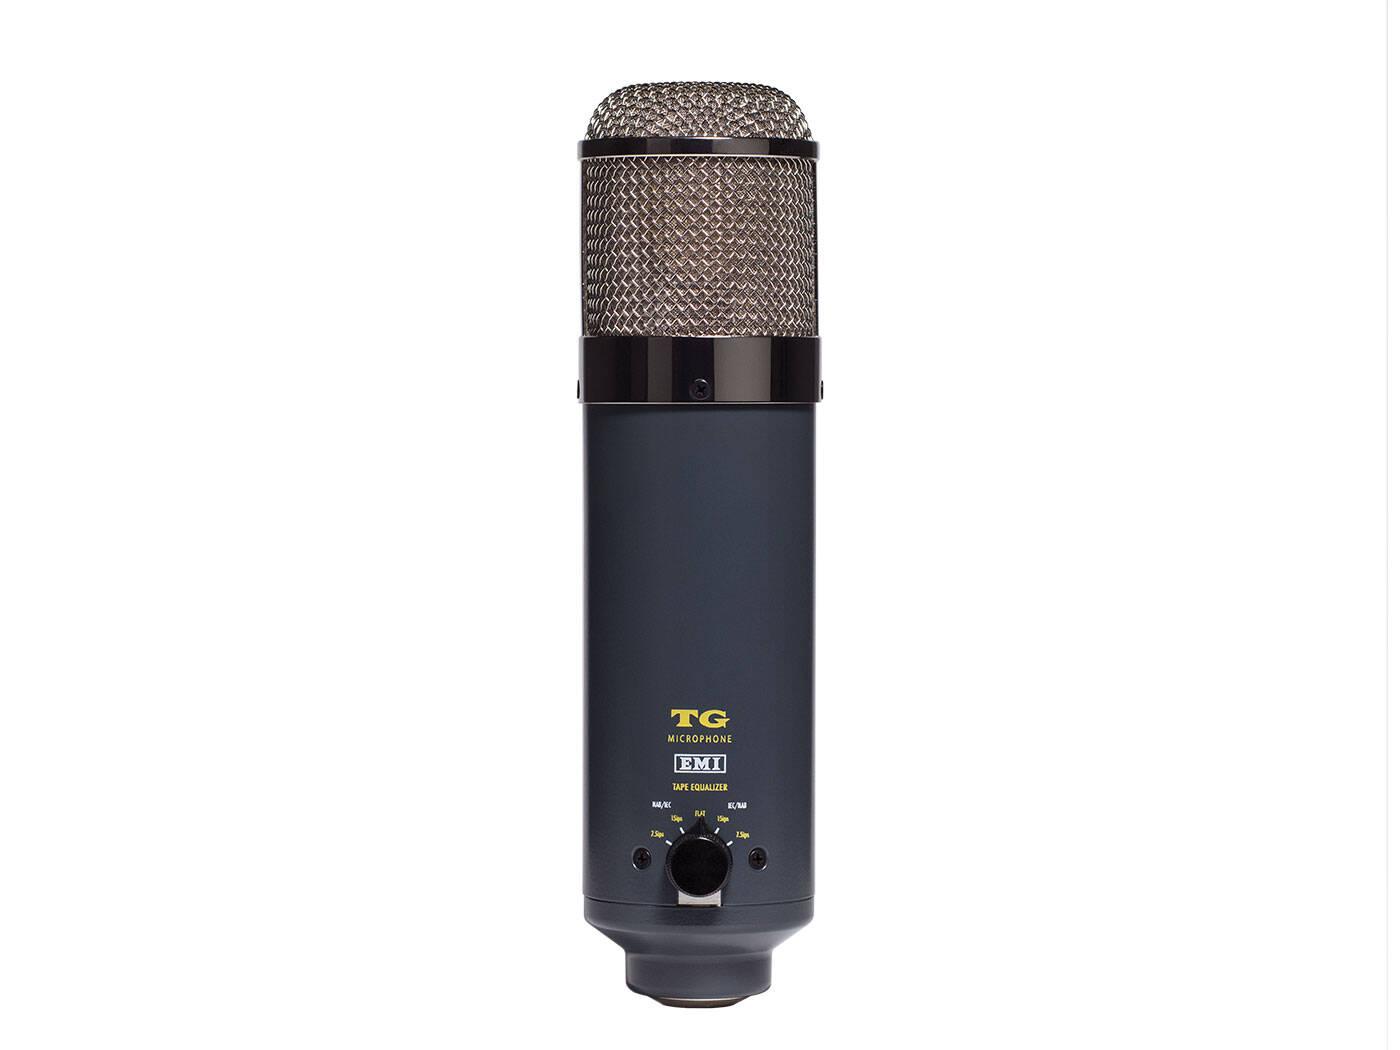 Chandler_Limited_EMI_Abbey_Road_Studios_TG_Microphone_rear_trans_4white_BG